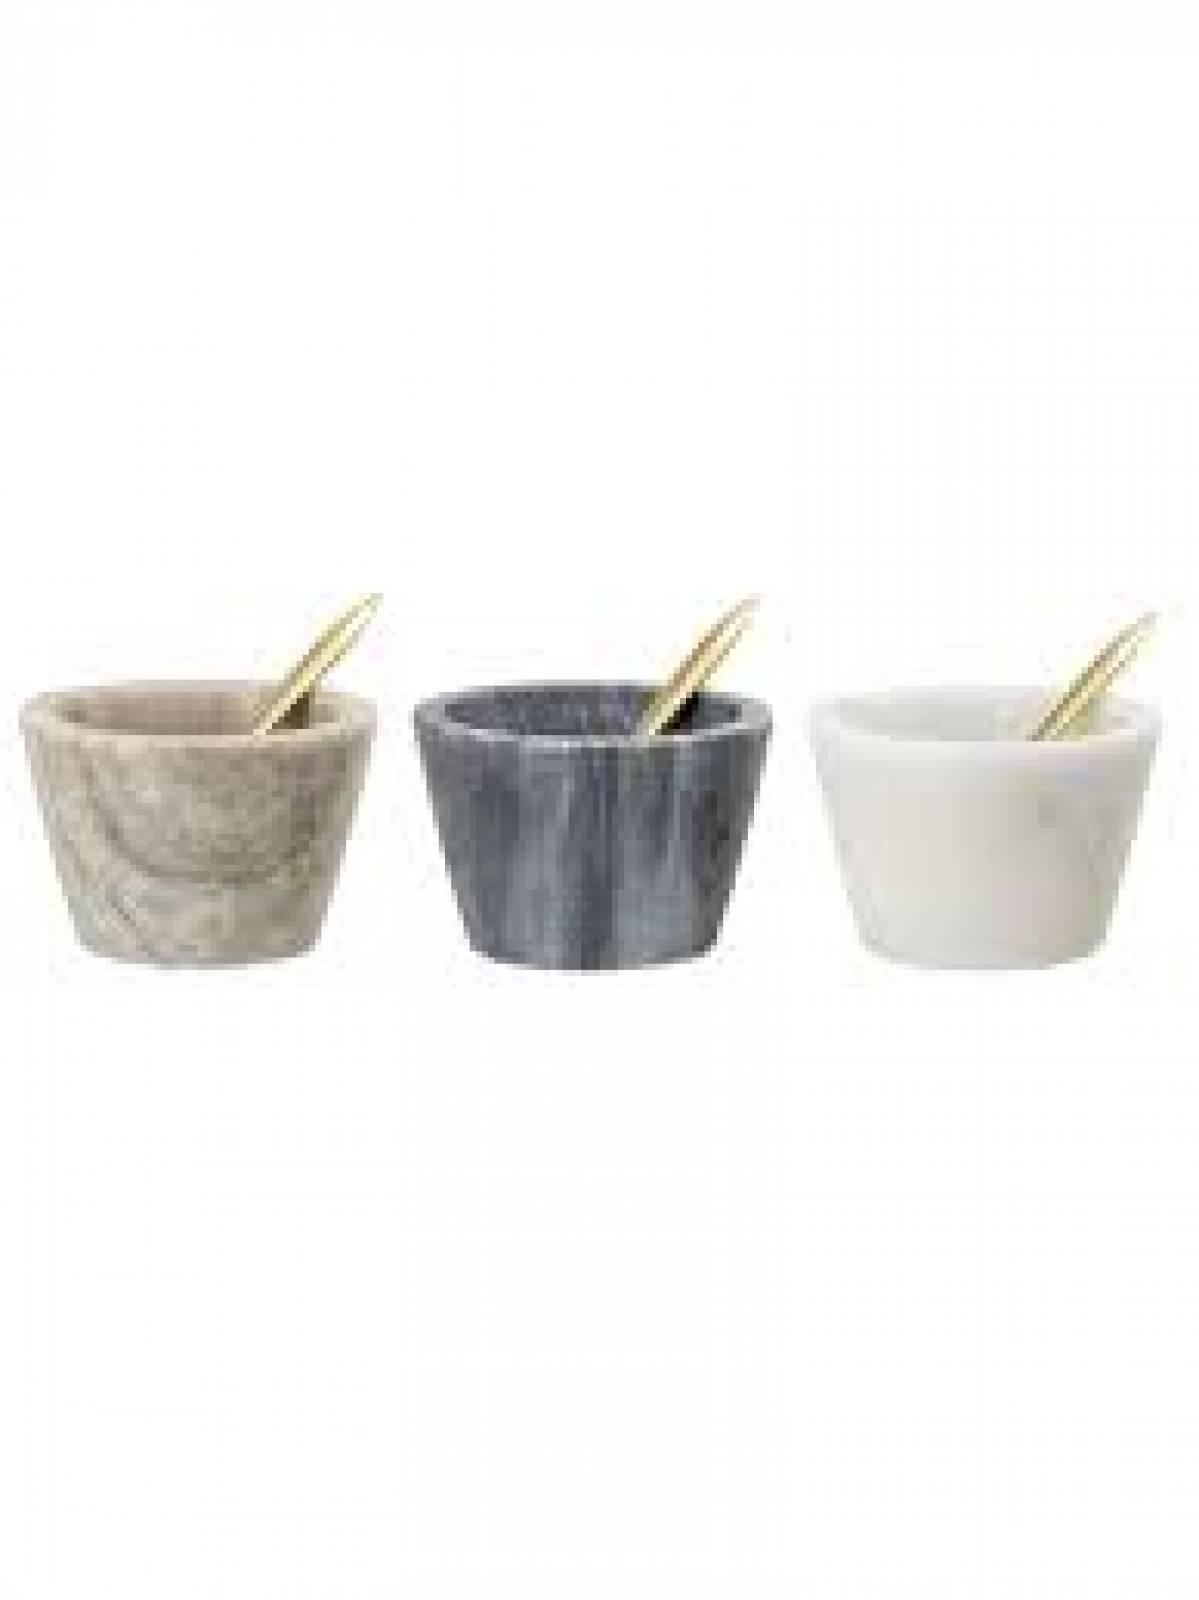 Marble Salt Jar With Spoon Various Colours 7.5x5cm thumbnails